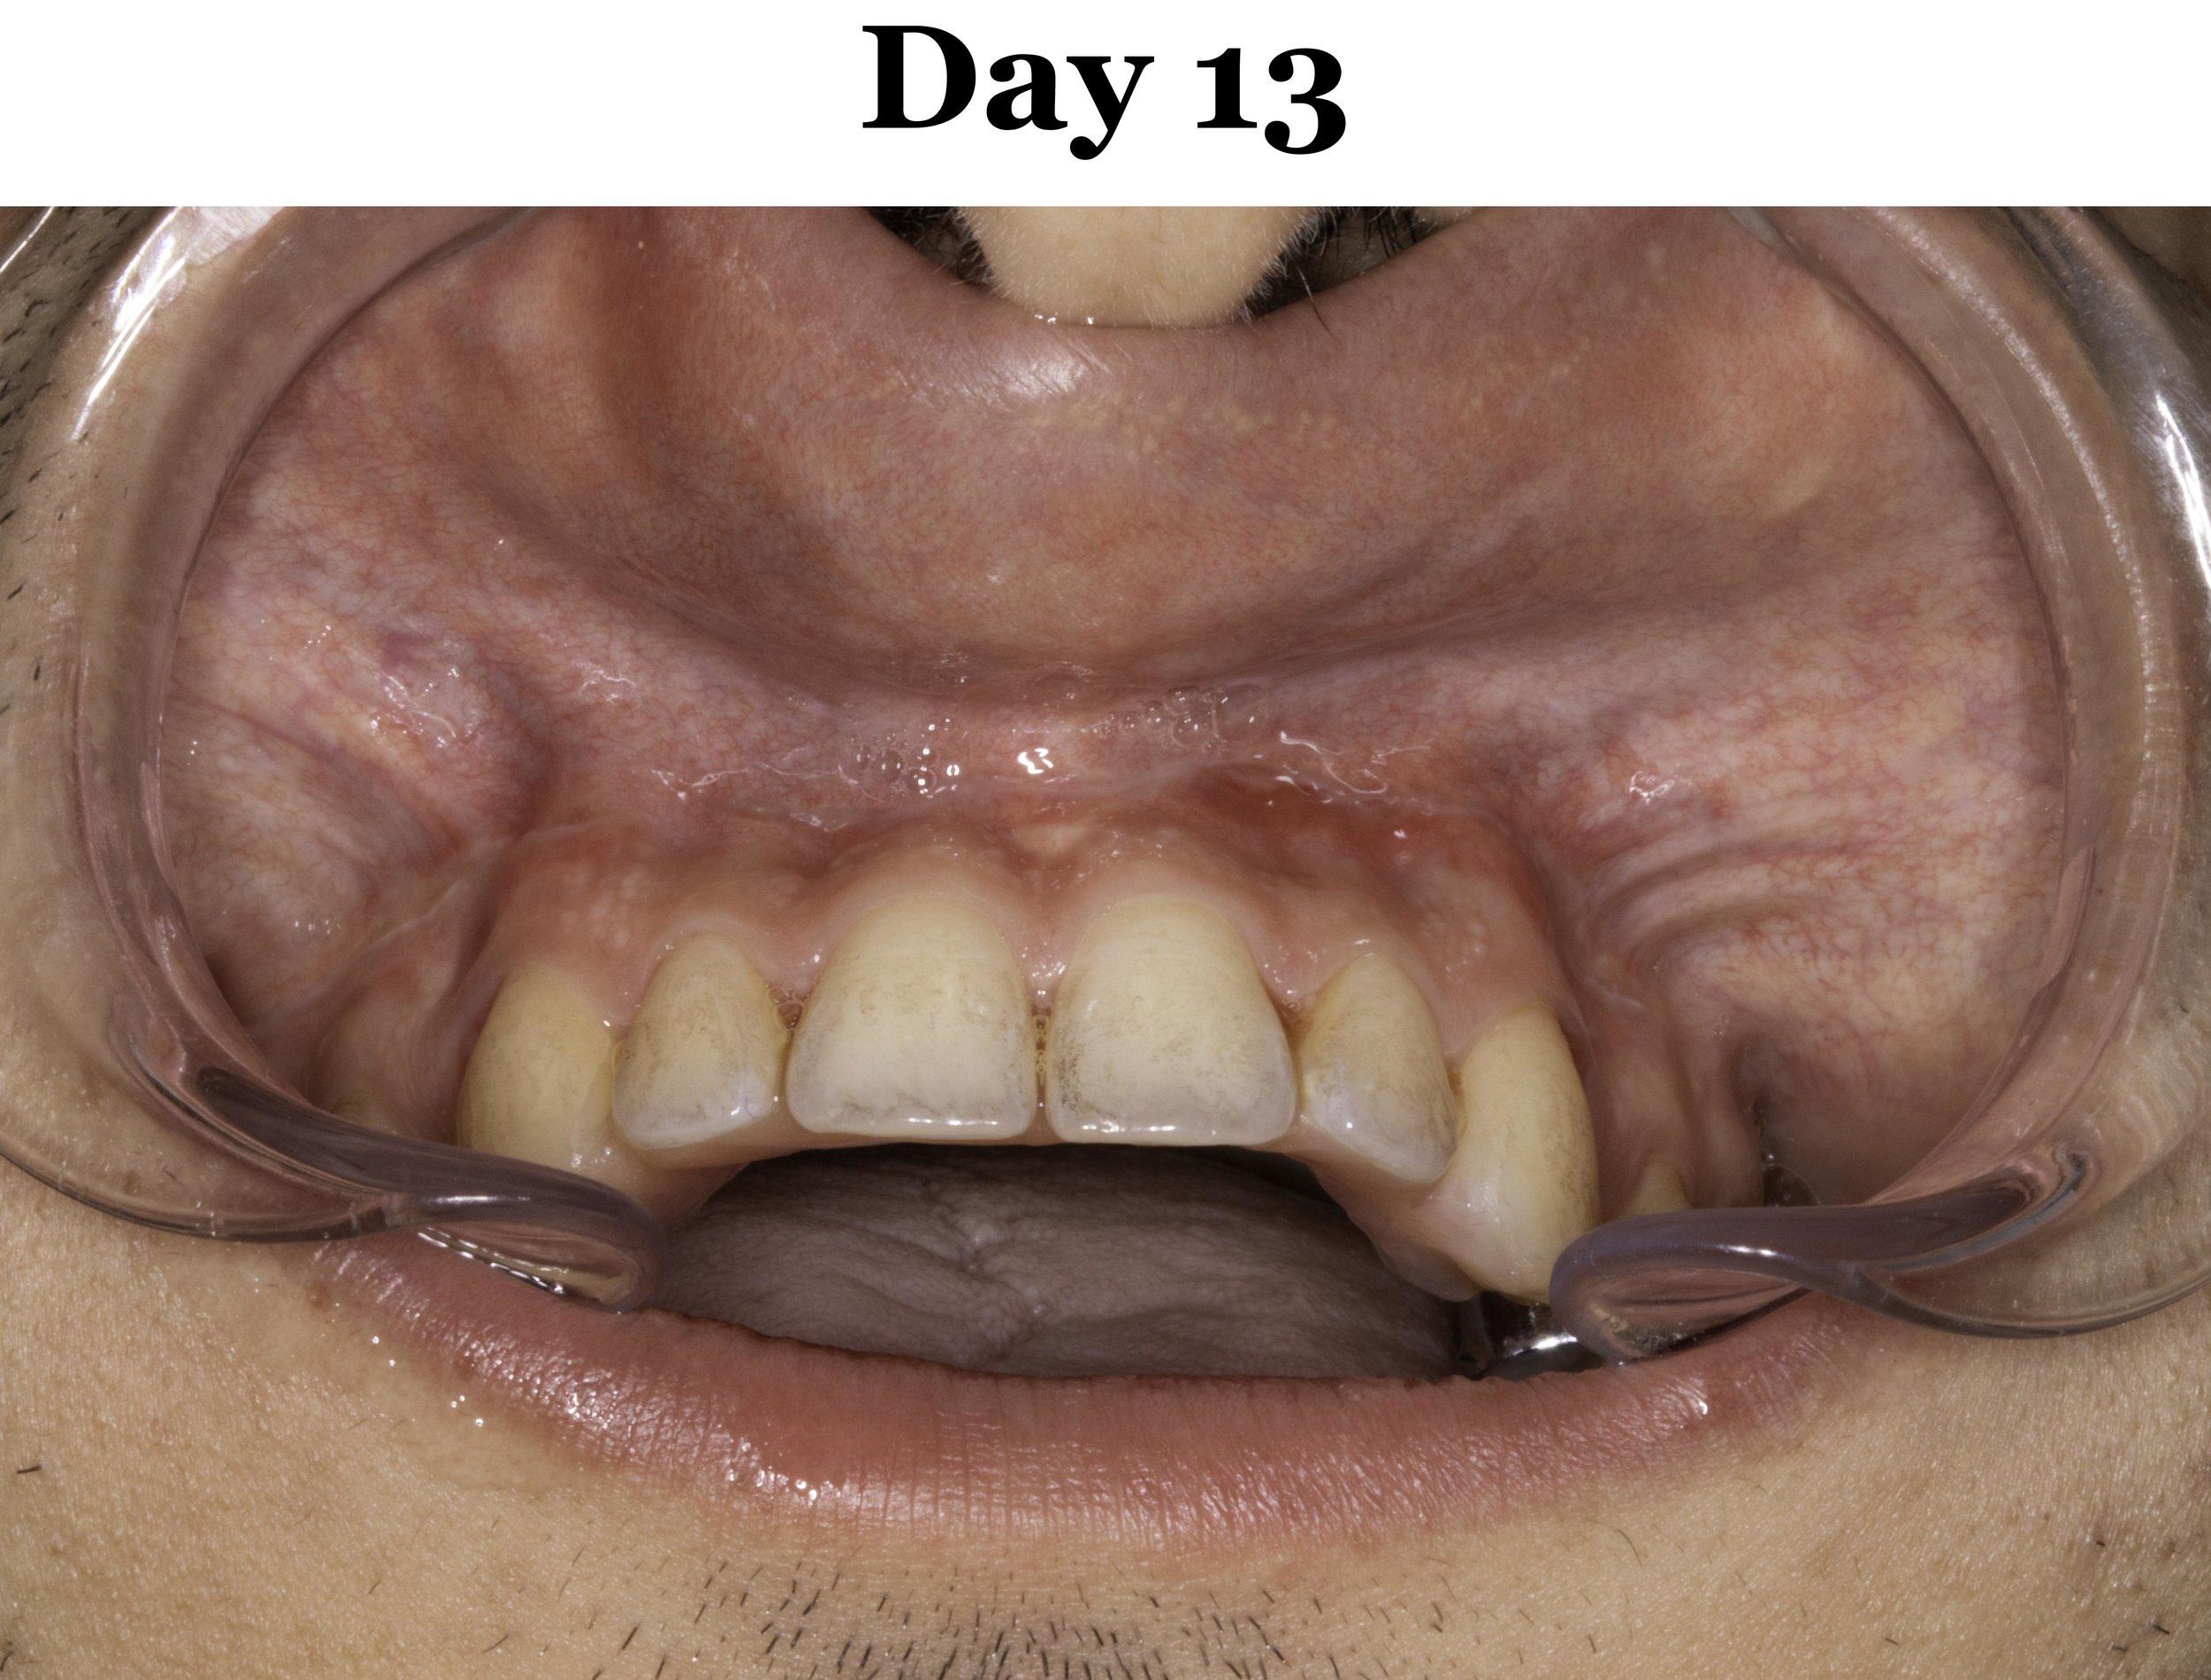 Lip Tie Release Day 13_Upper.jpg